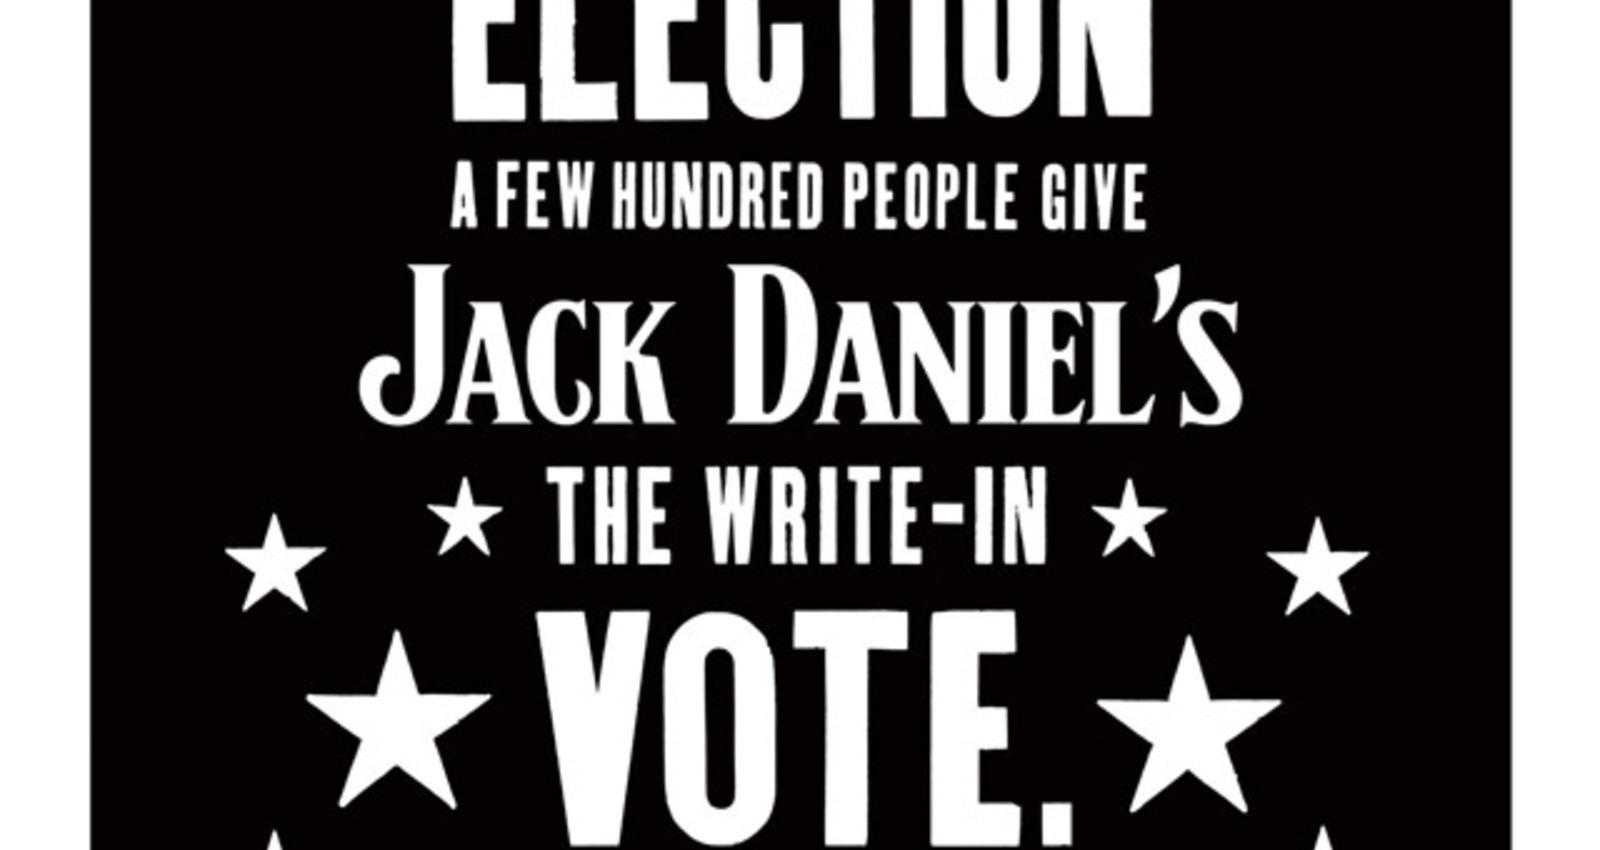 Common Ground/Dictatorships/Champagne/Socialist/Write-in Vote